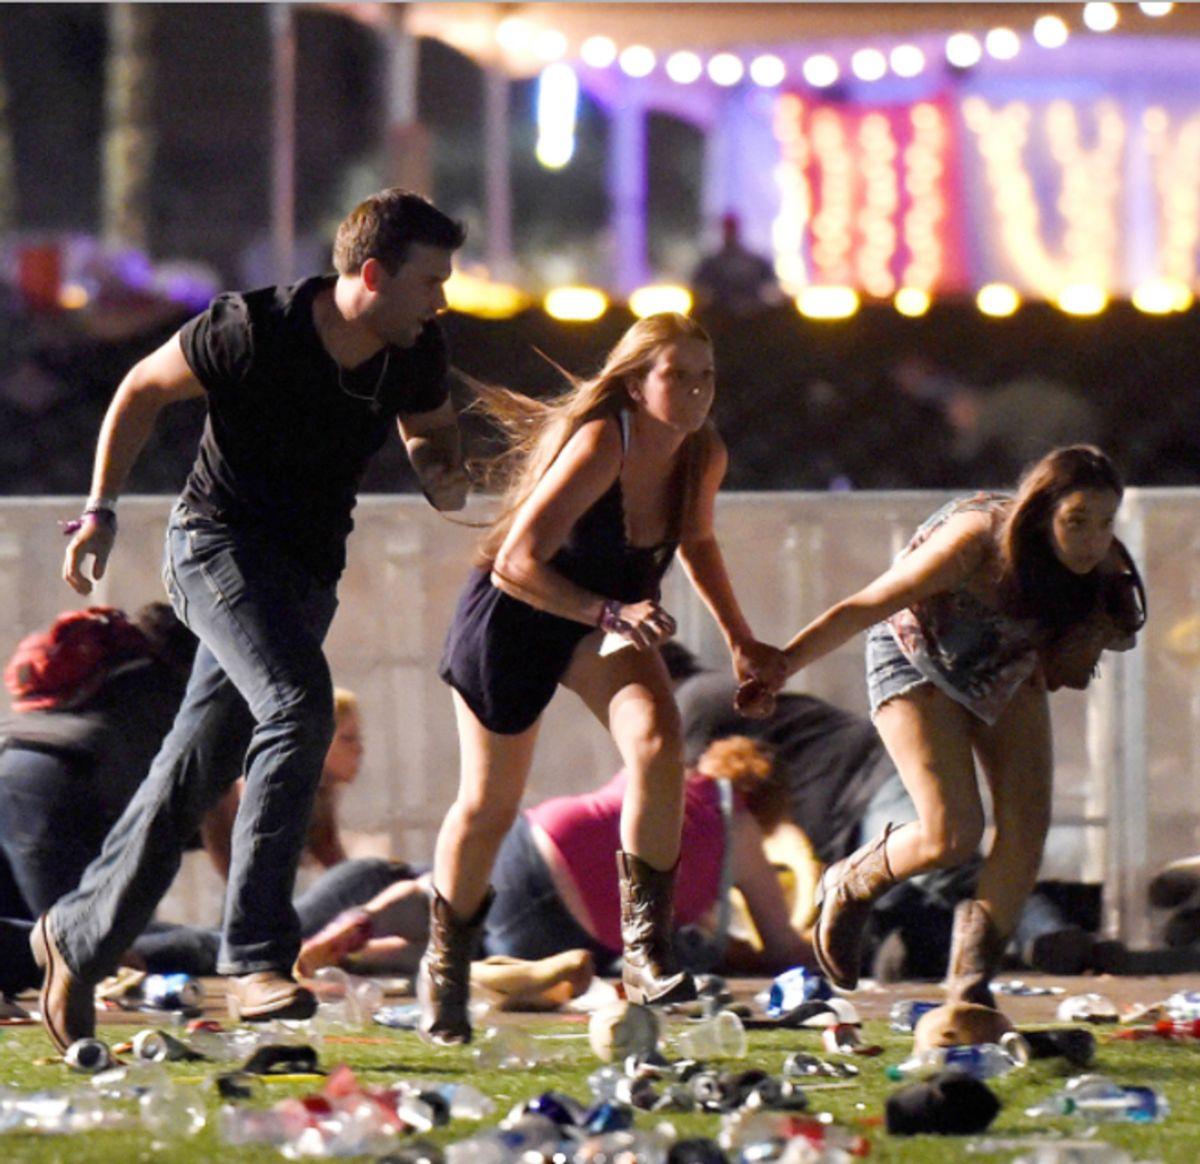 Gun Control Won't Prevent Events Like The Las Vegas Shooting